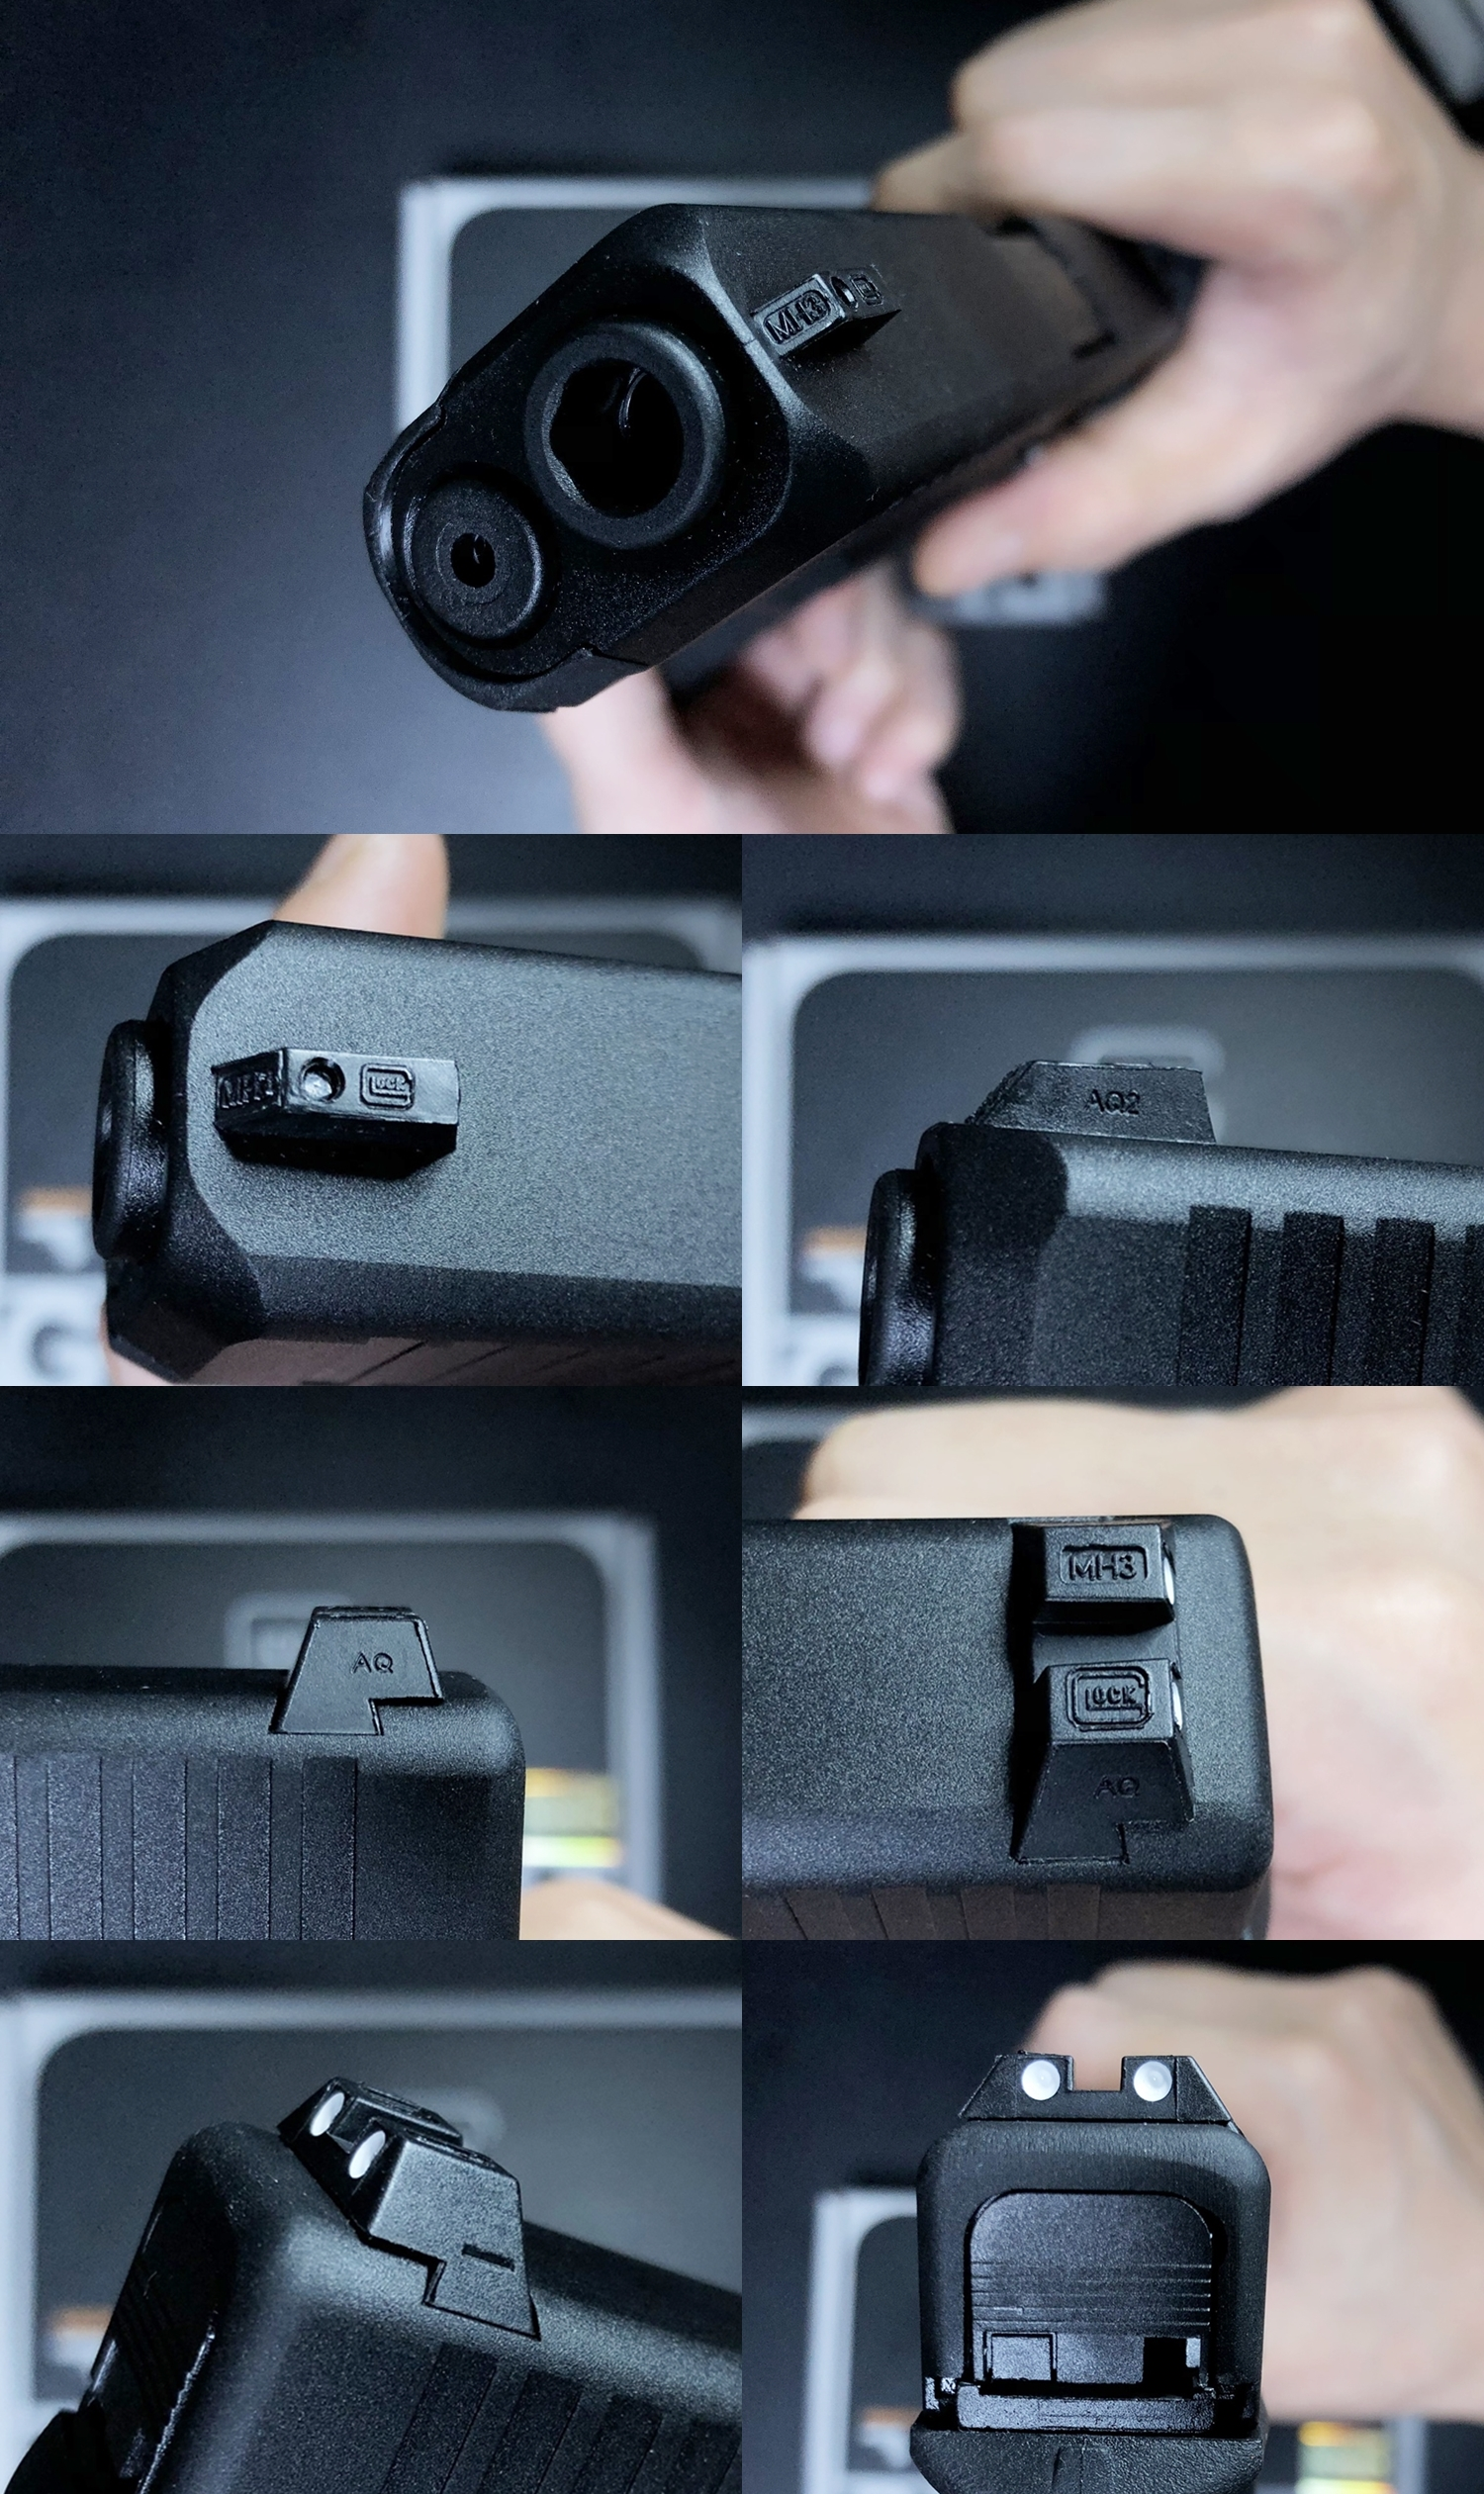 6 UMAREX VFC GLOCK G45 GBB AIRSOFT!! 噂のウマレックス G45 グロック ガスブローバック!! やっと我が家へ着弾 ~ 新品箱出し編!! 購入 開封 初速 計測 検証 比較 通常分解 組立 カスタム レビュー!!